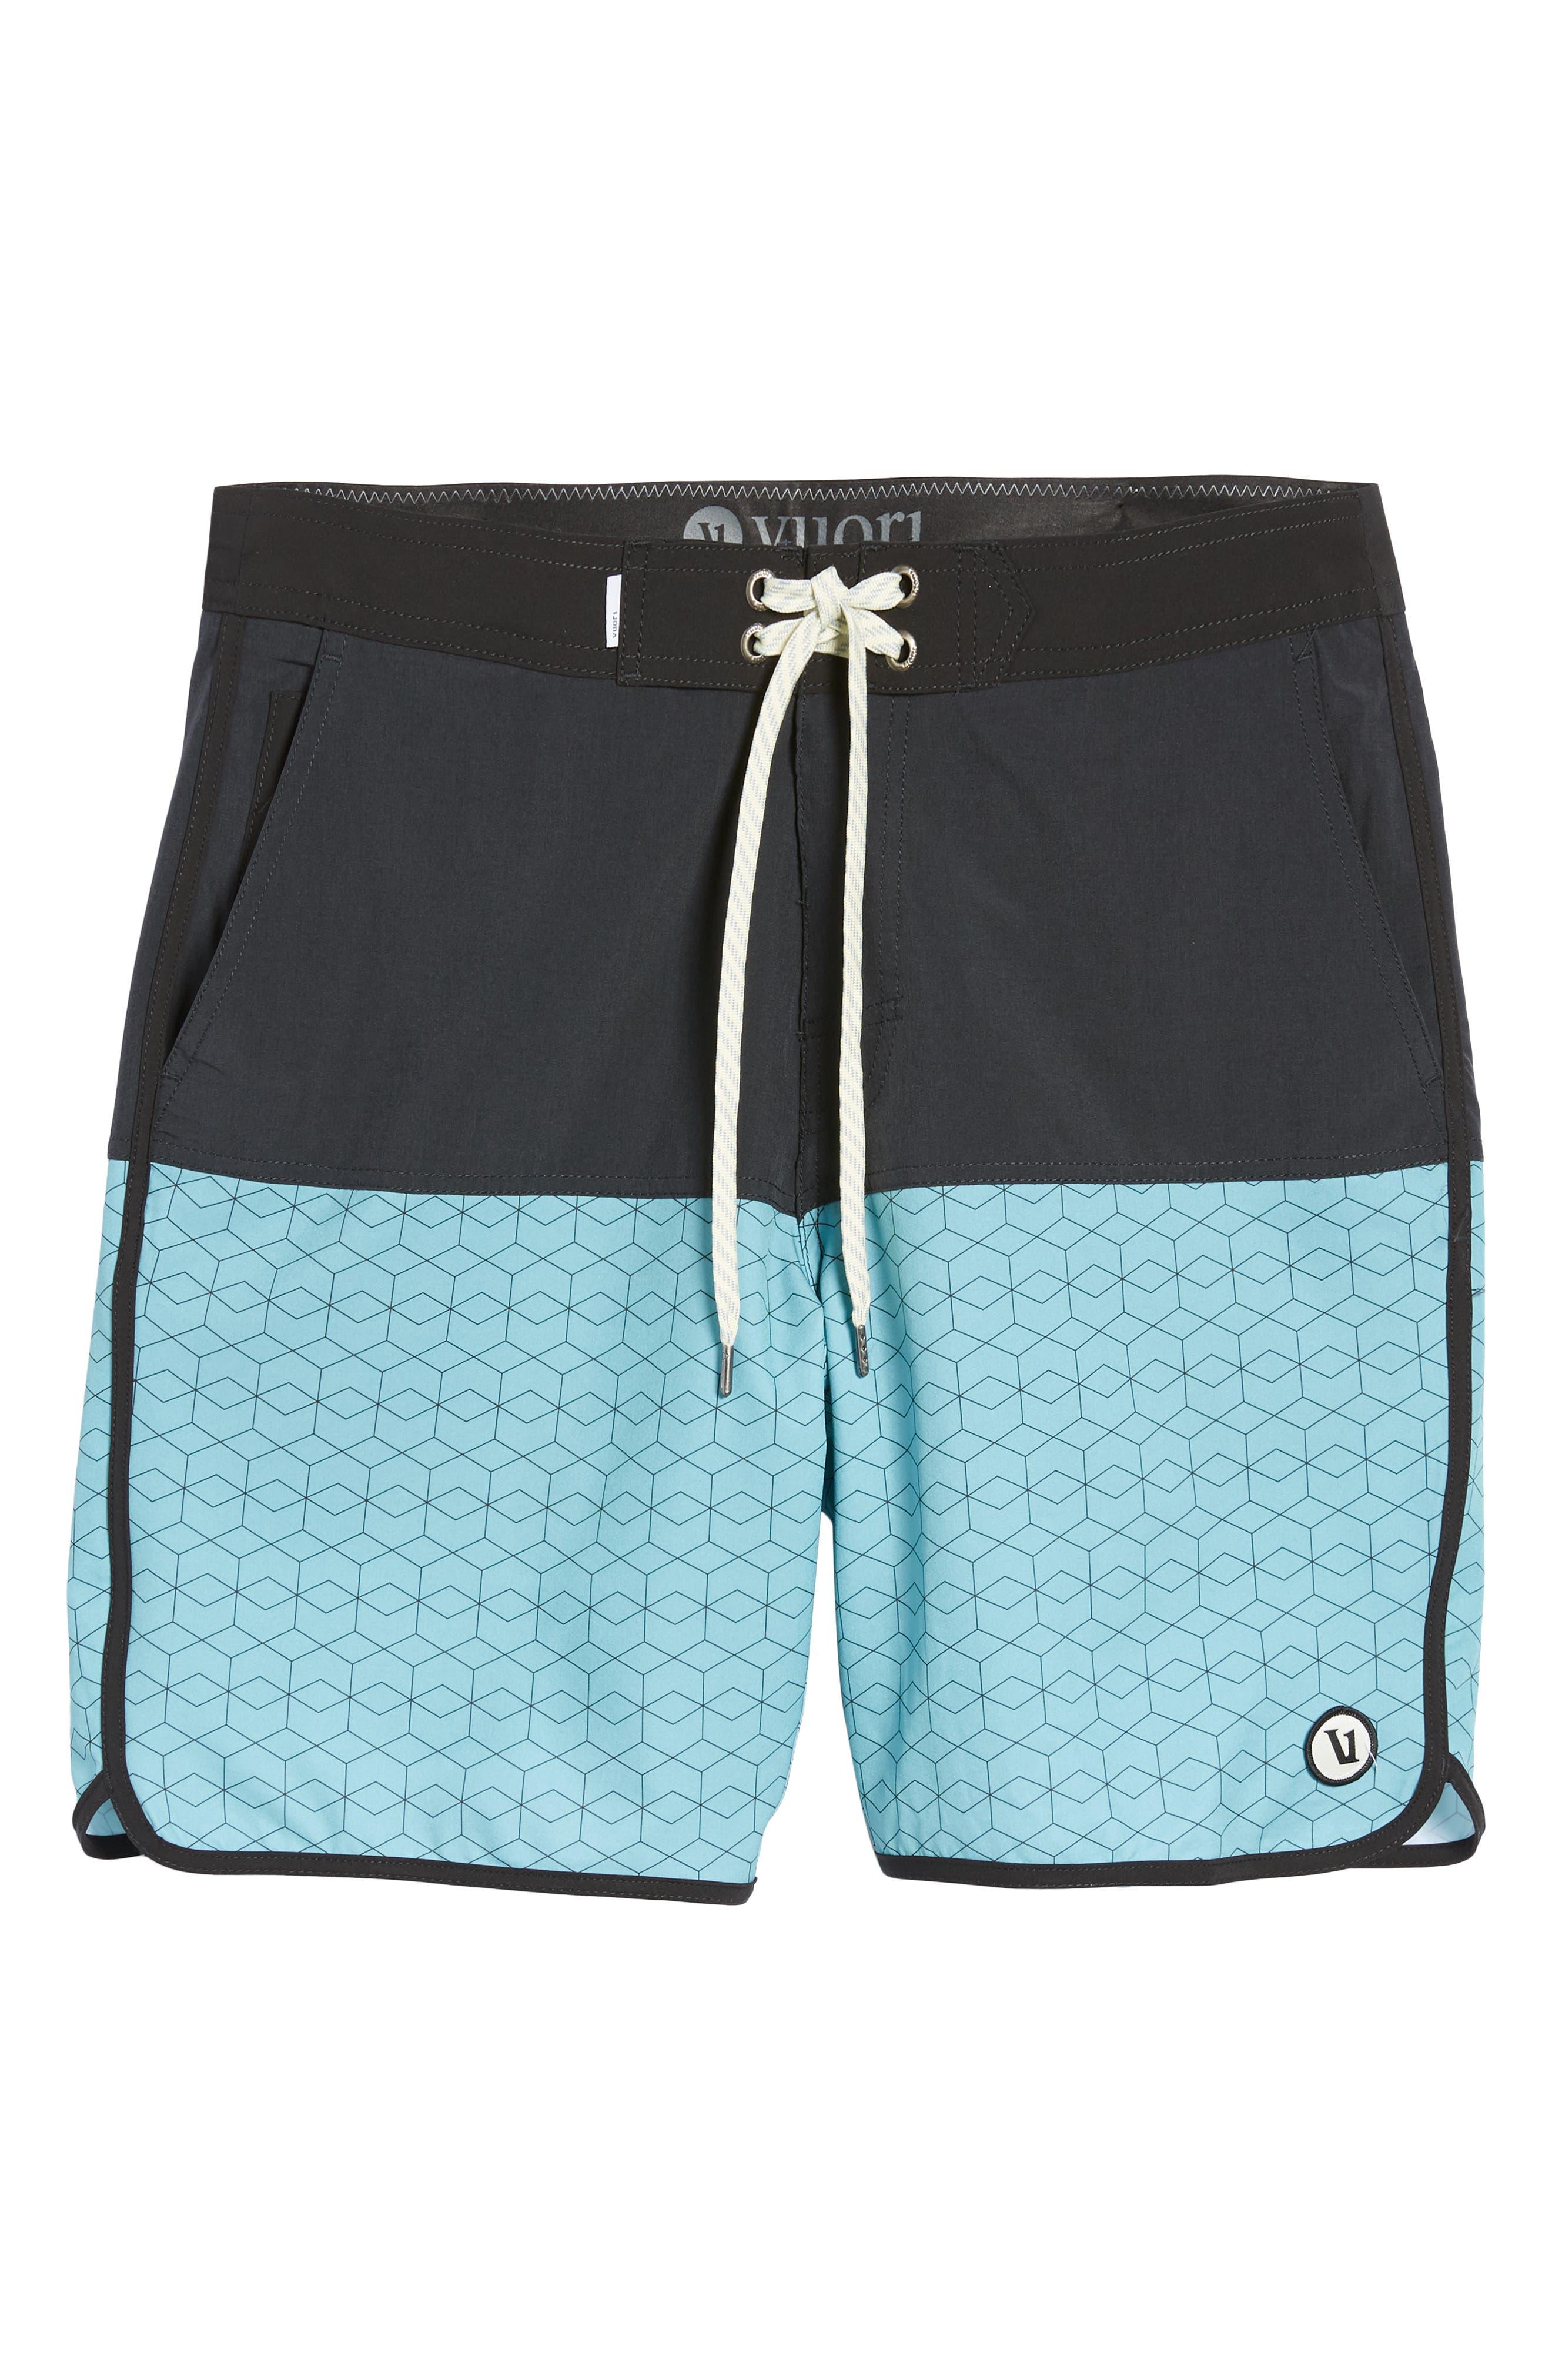 Cruise Hybrid Board Shorts,                             Alternate thumbnail 6, color,                             401